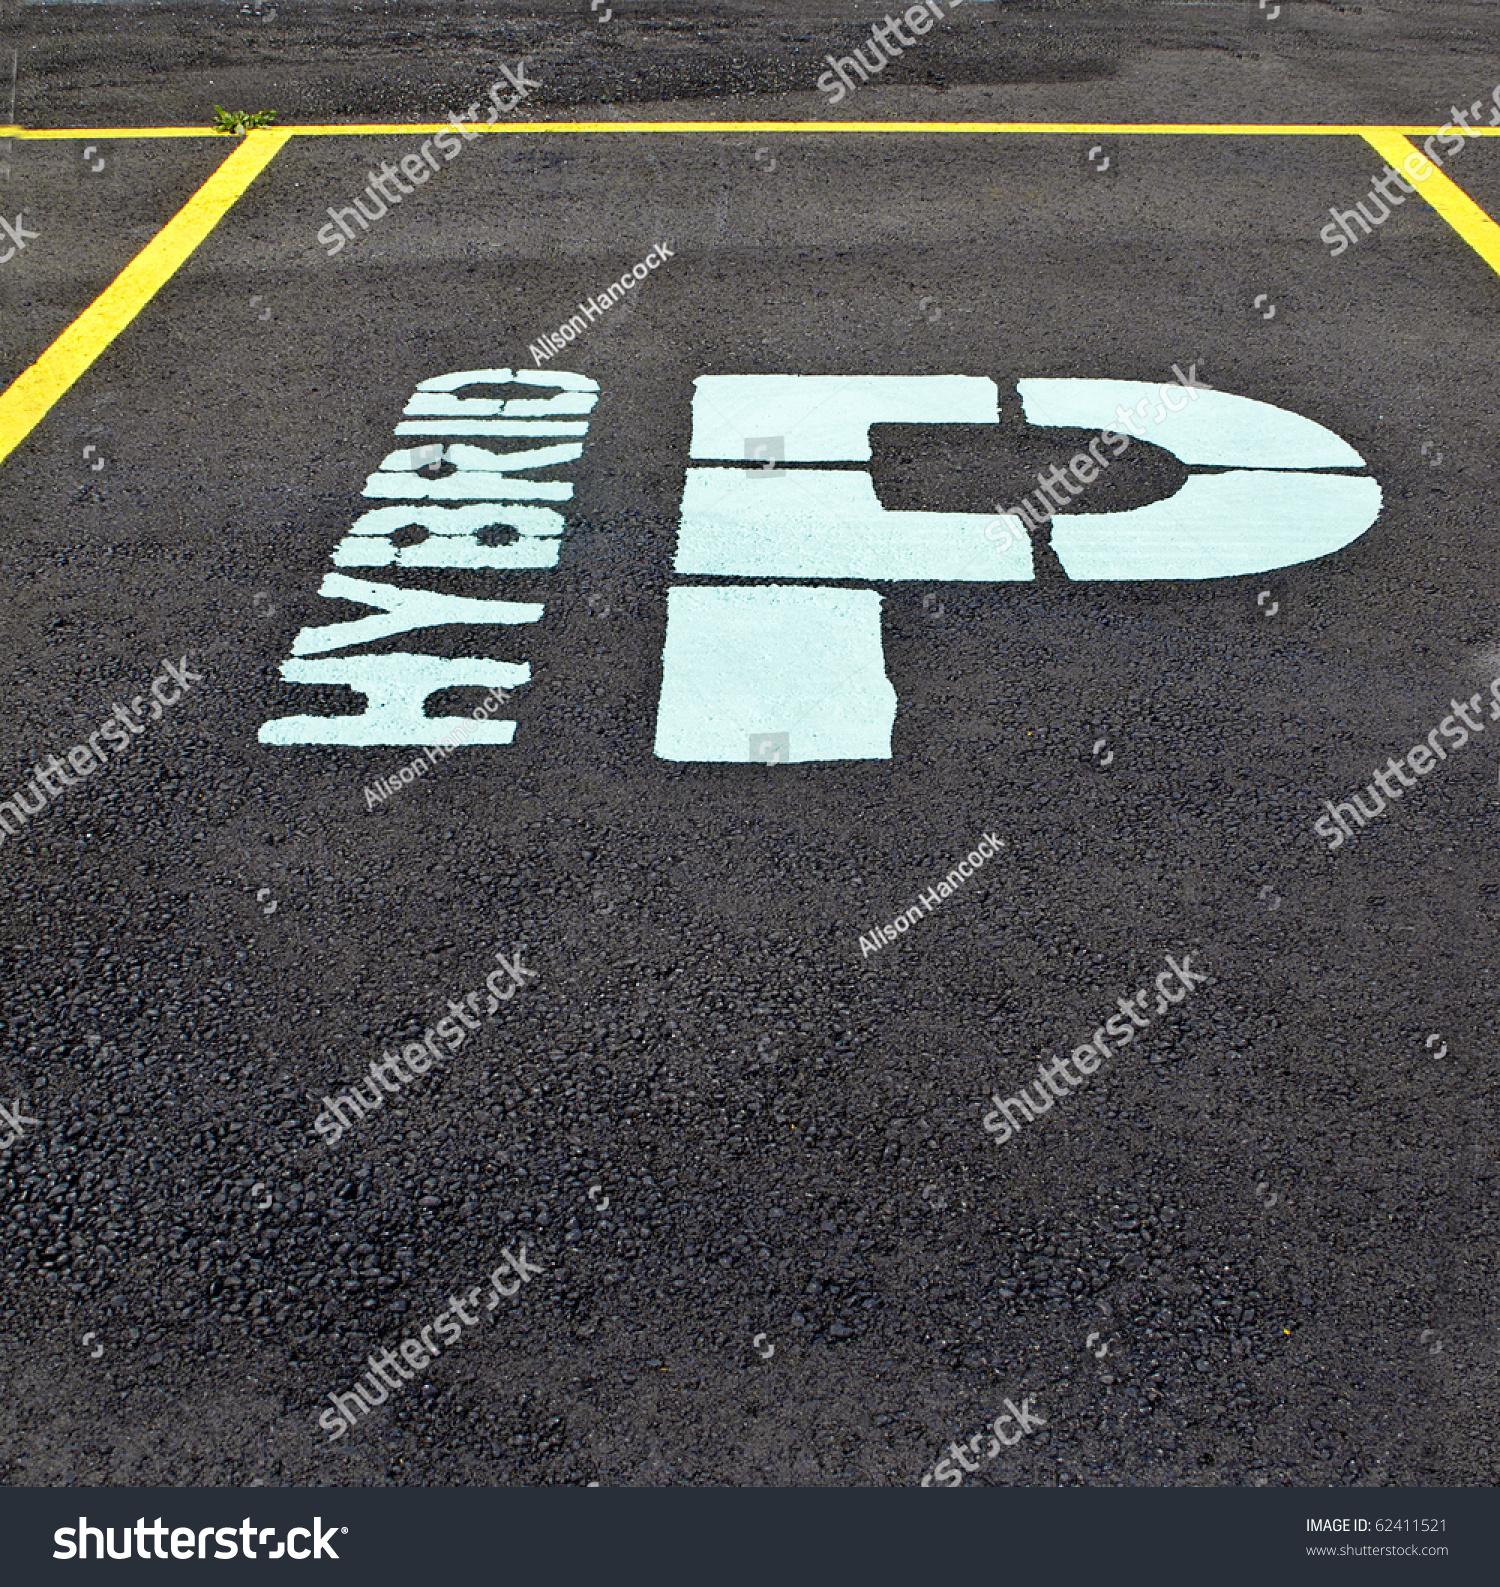 Designated Parking Spot For Hybrid Car Stock Photo